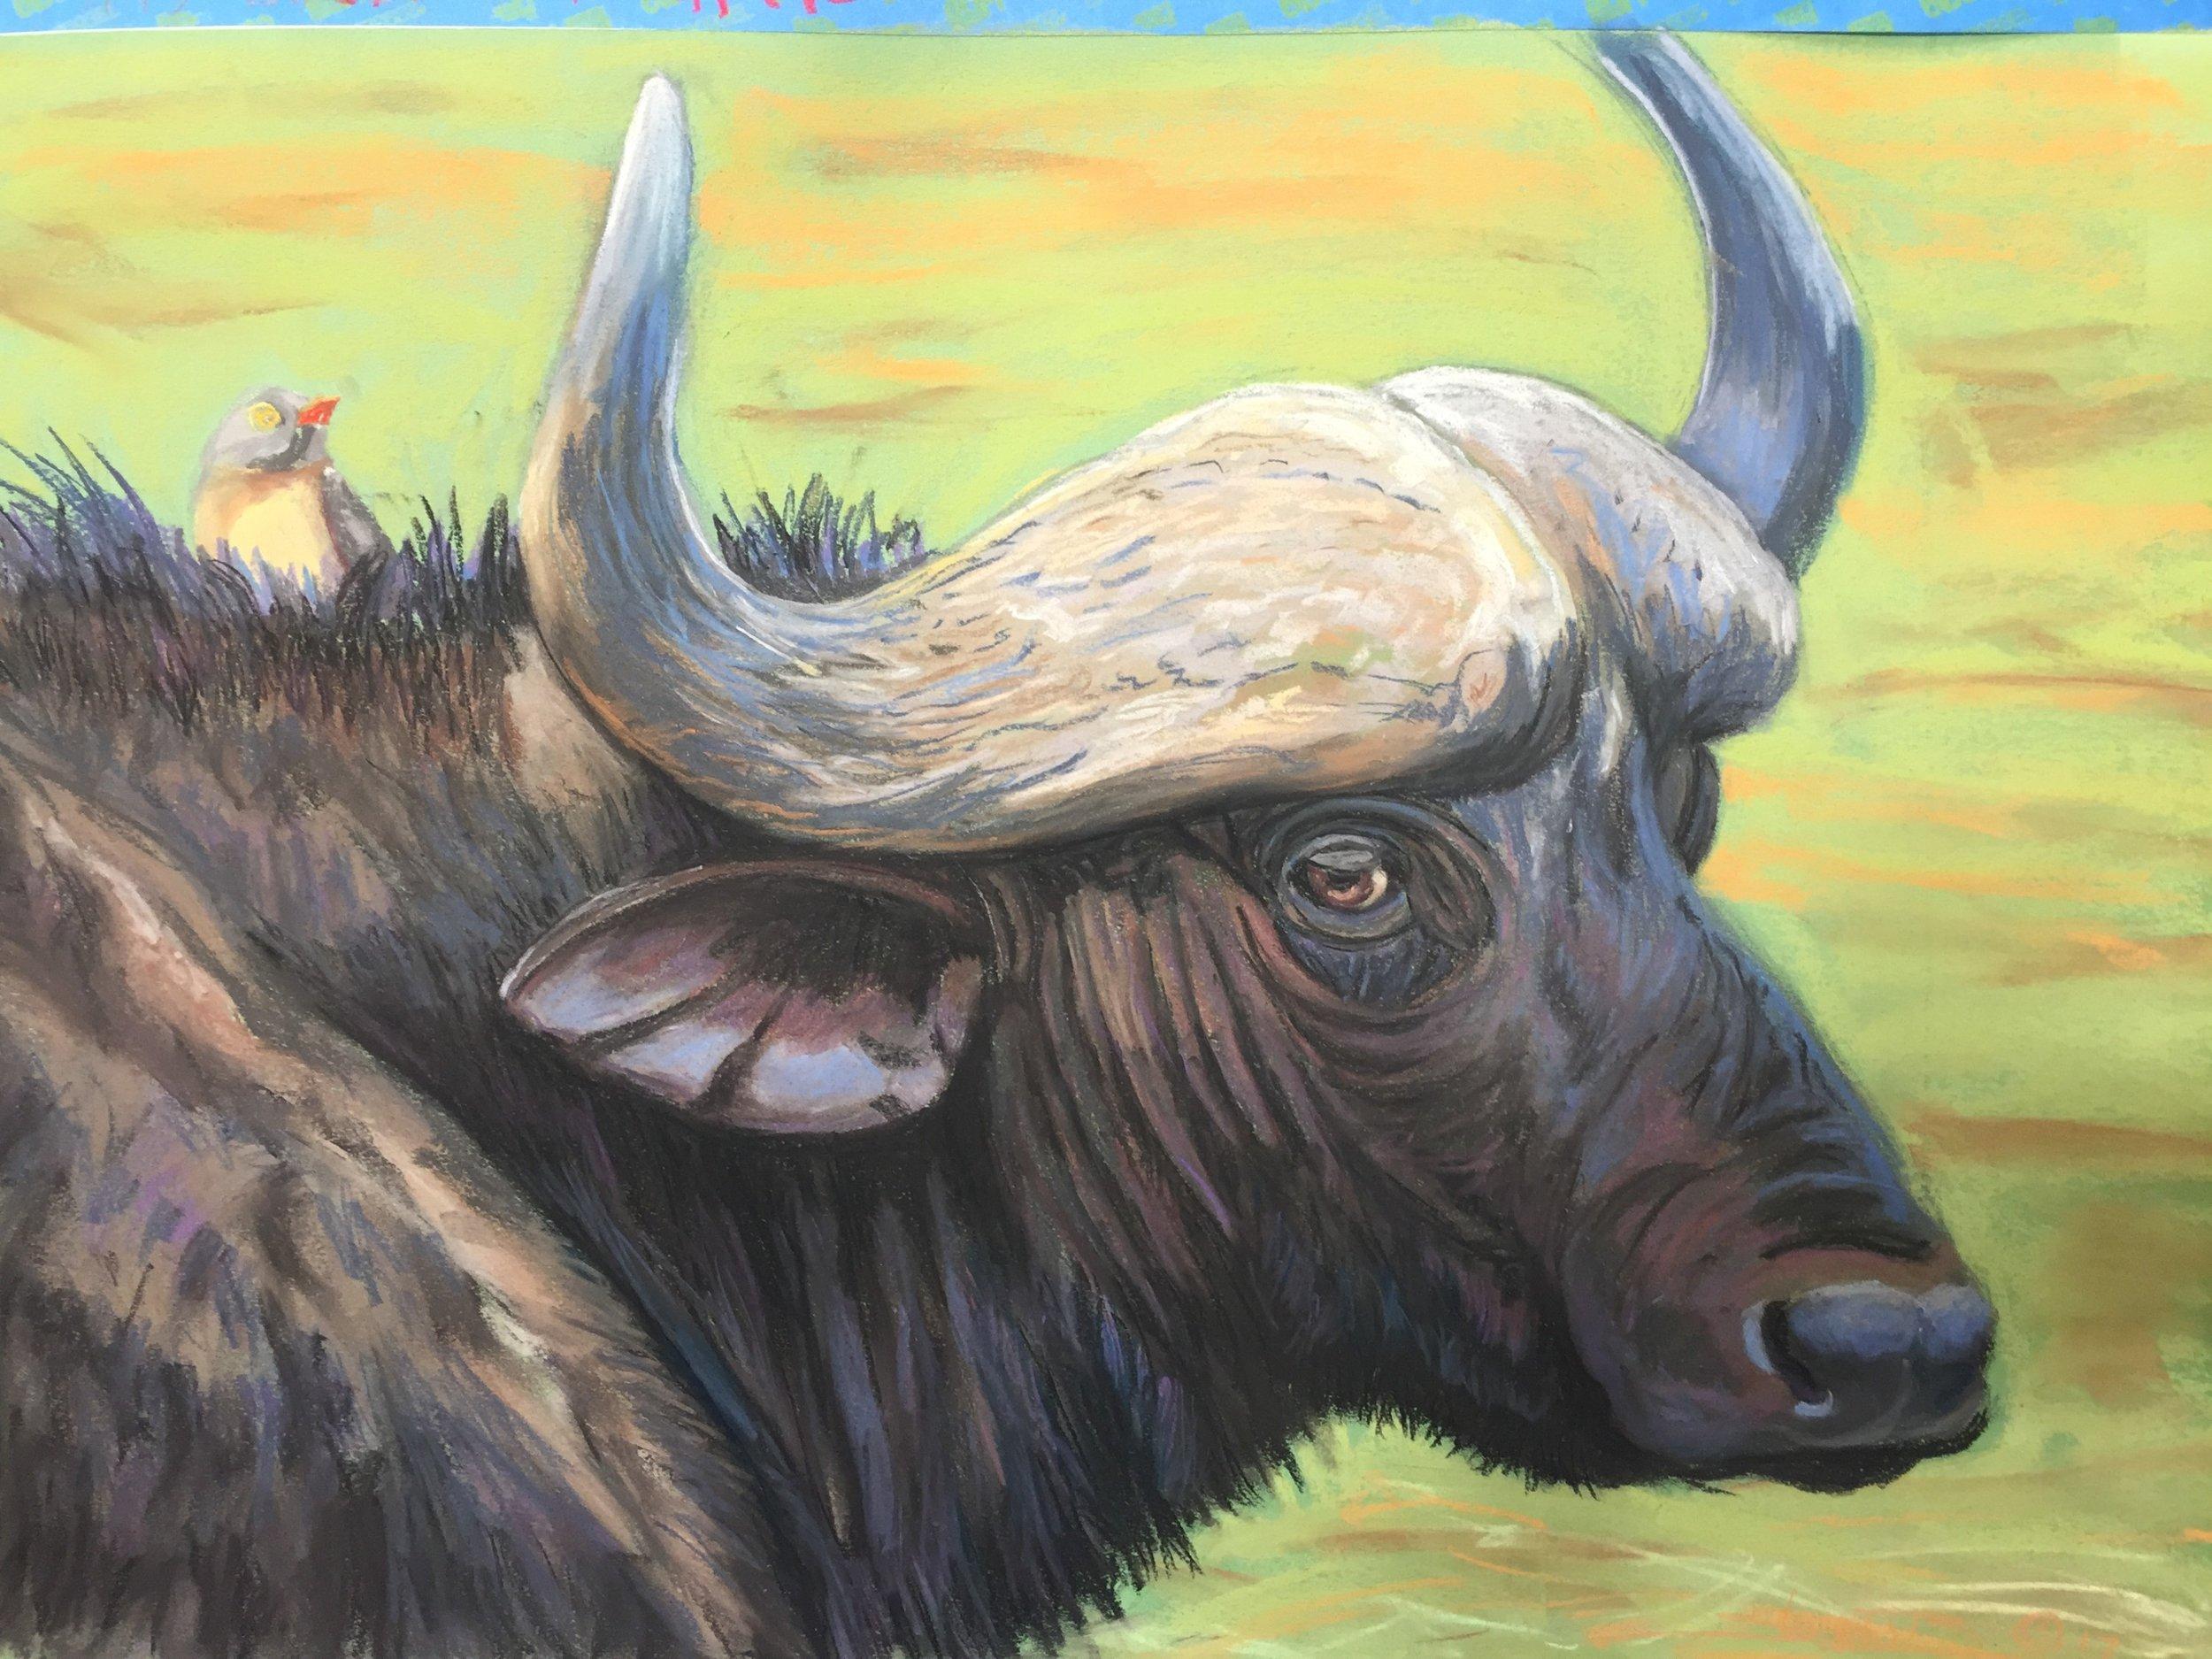 Cape Buffalo & Friend  20 x 28  Pastel on Paper  2017